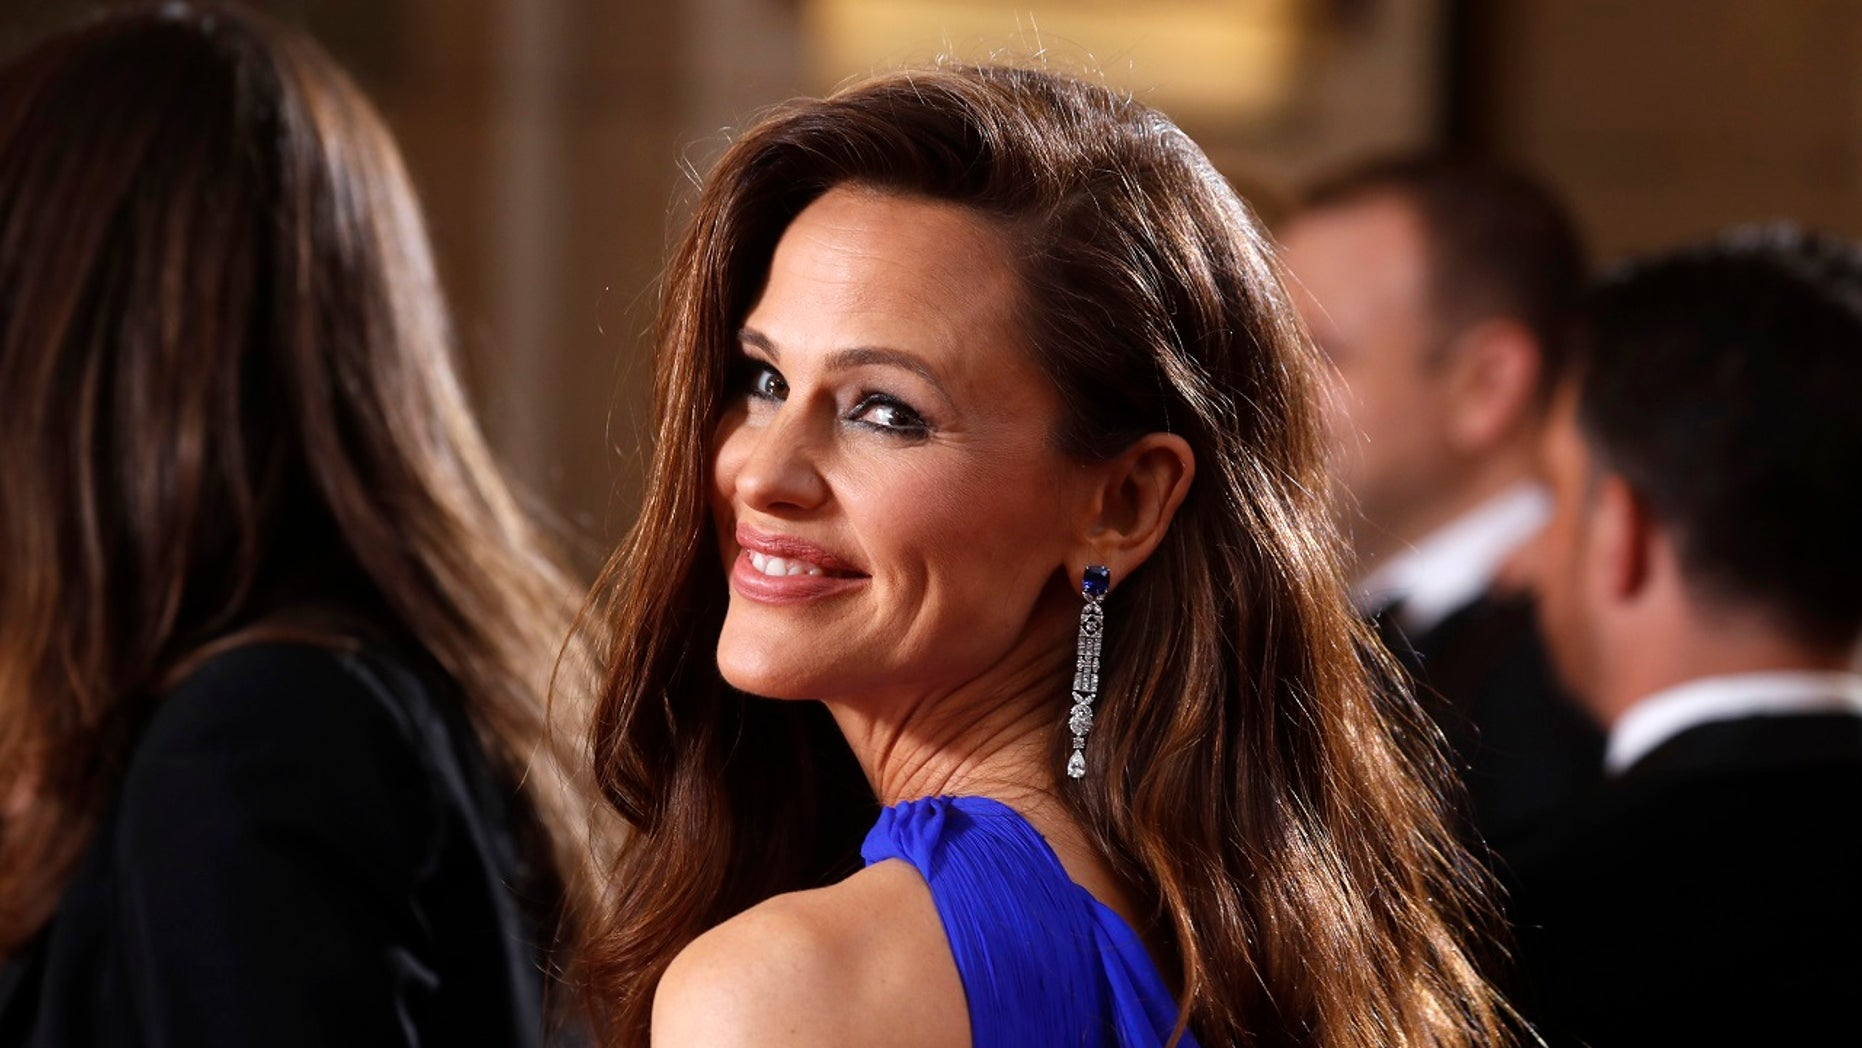 90th Academy Awards - Oscars Arrivals – Hollywood - Jennifer Garner wears Versace. REUTERS/Carlo Allegri - HP1EE3503CJVY